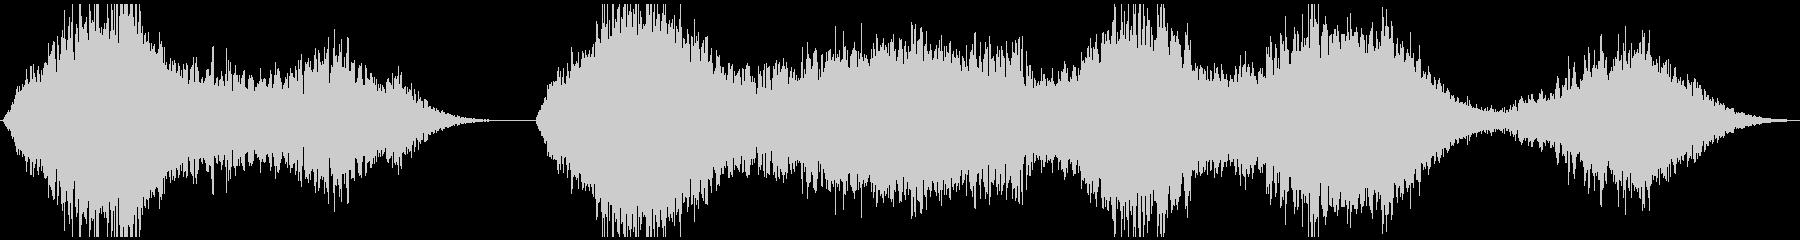 PADS 合唱団パッド01の未再生の波形